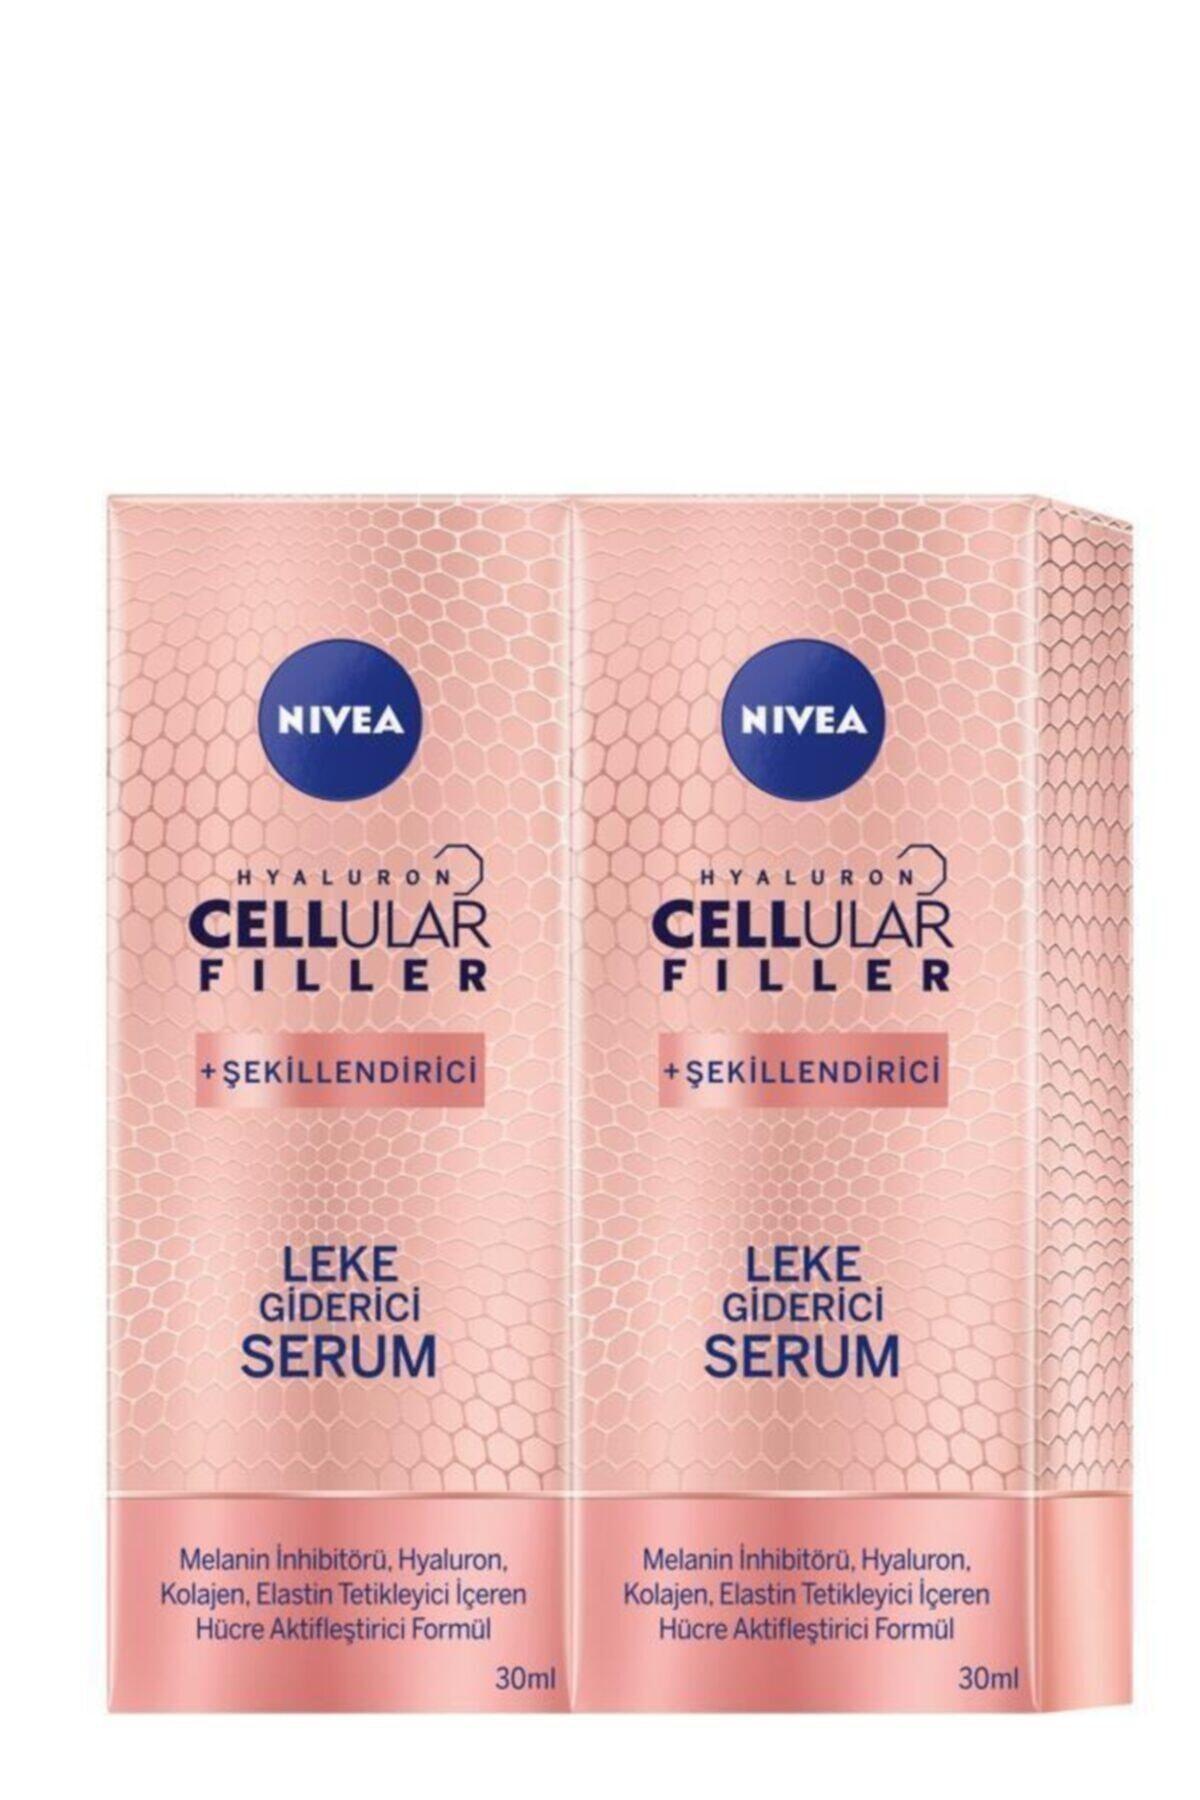 Hyaluron Cellular Filler Leke Giderici Serum 30 ml X 2